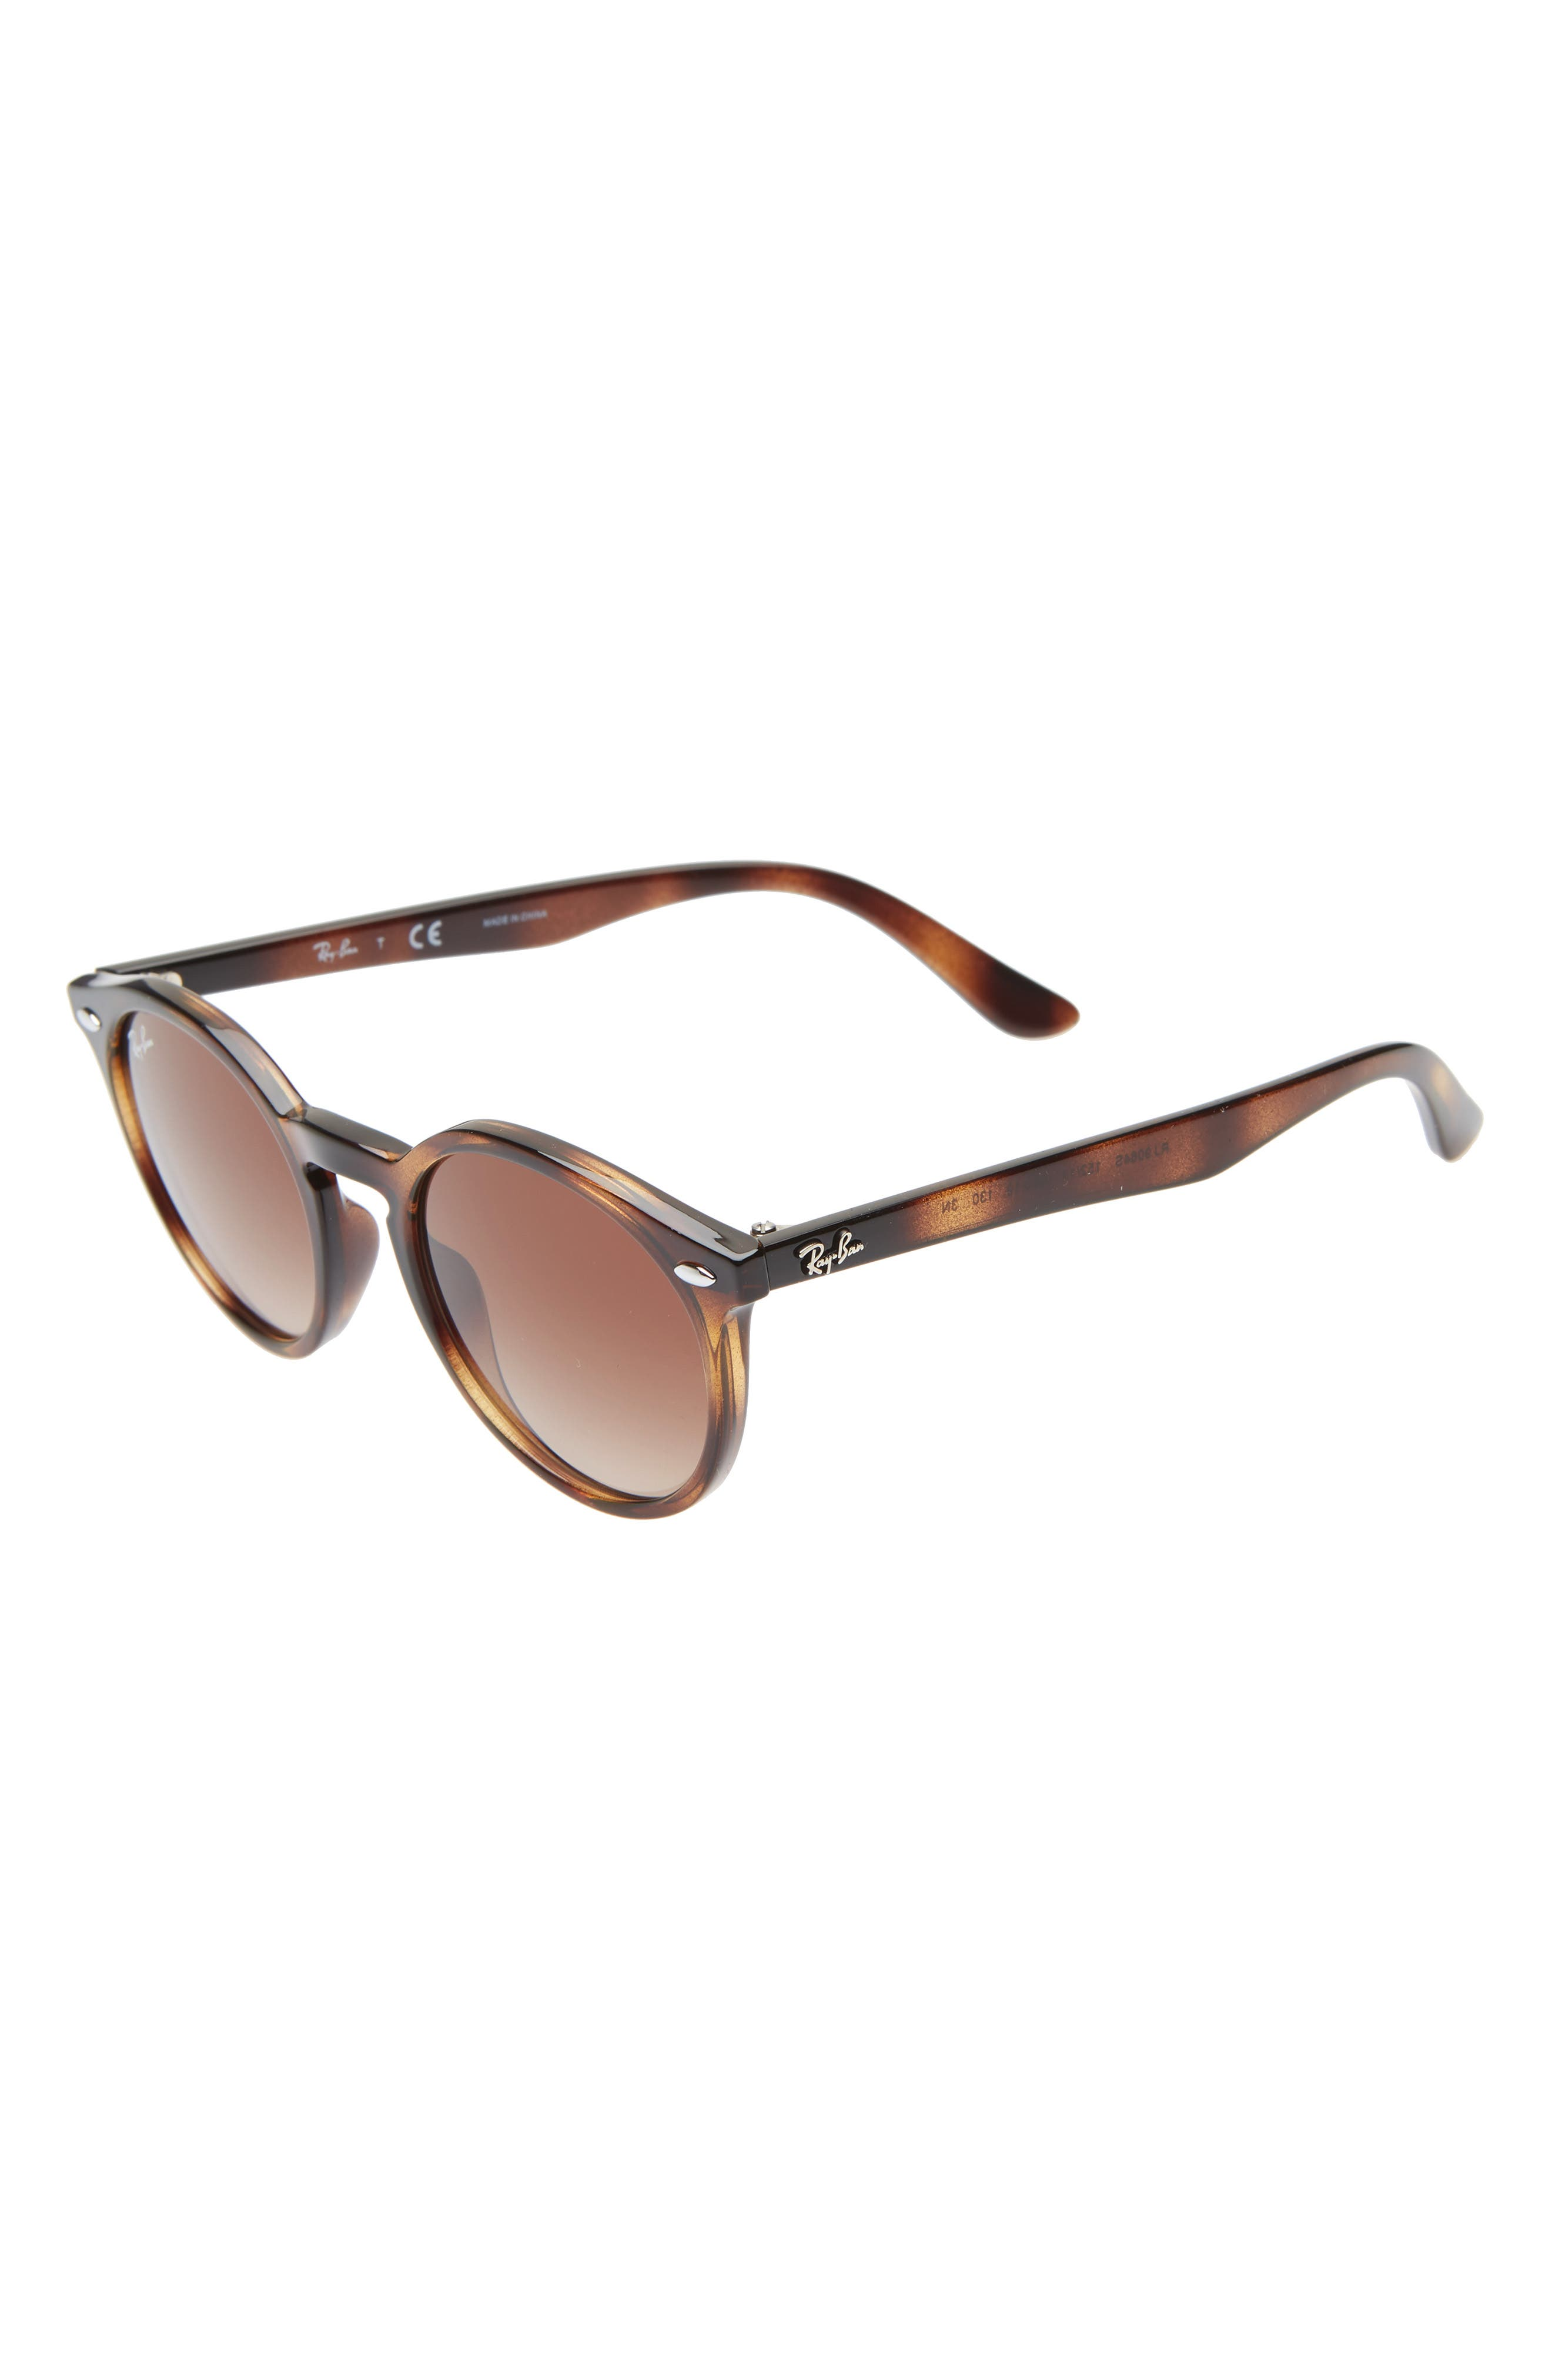 Ray-Ban Junior 4m Round Sunglasses - Shiny Havana/ Brown Gradient